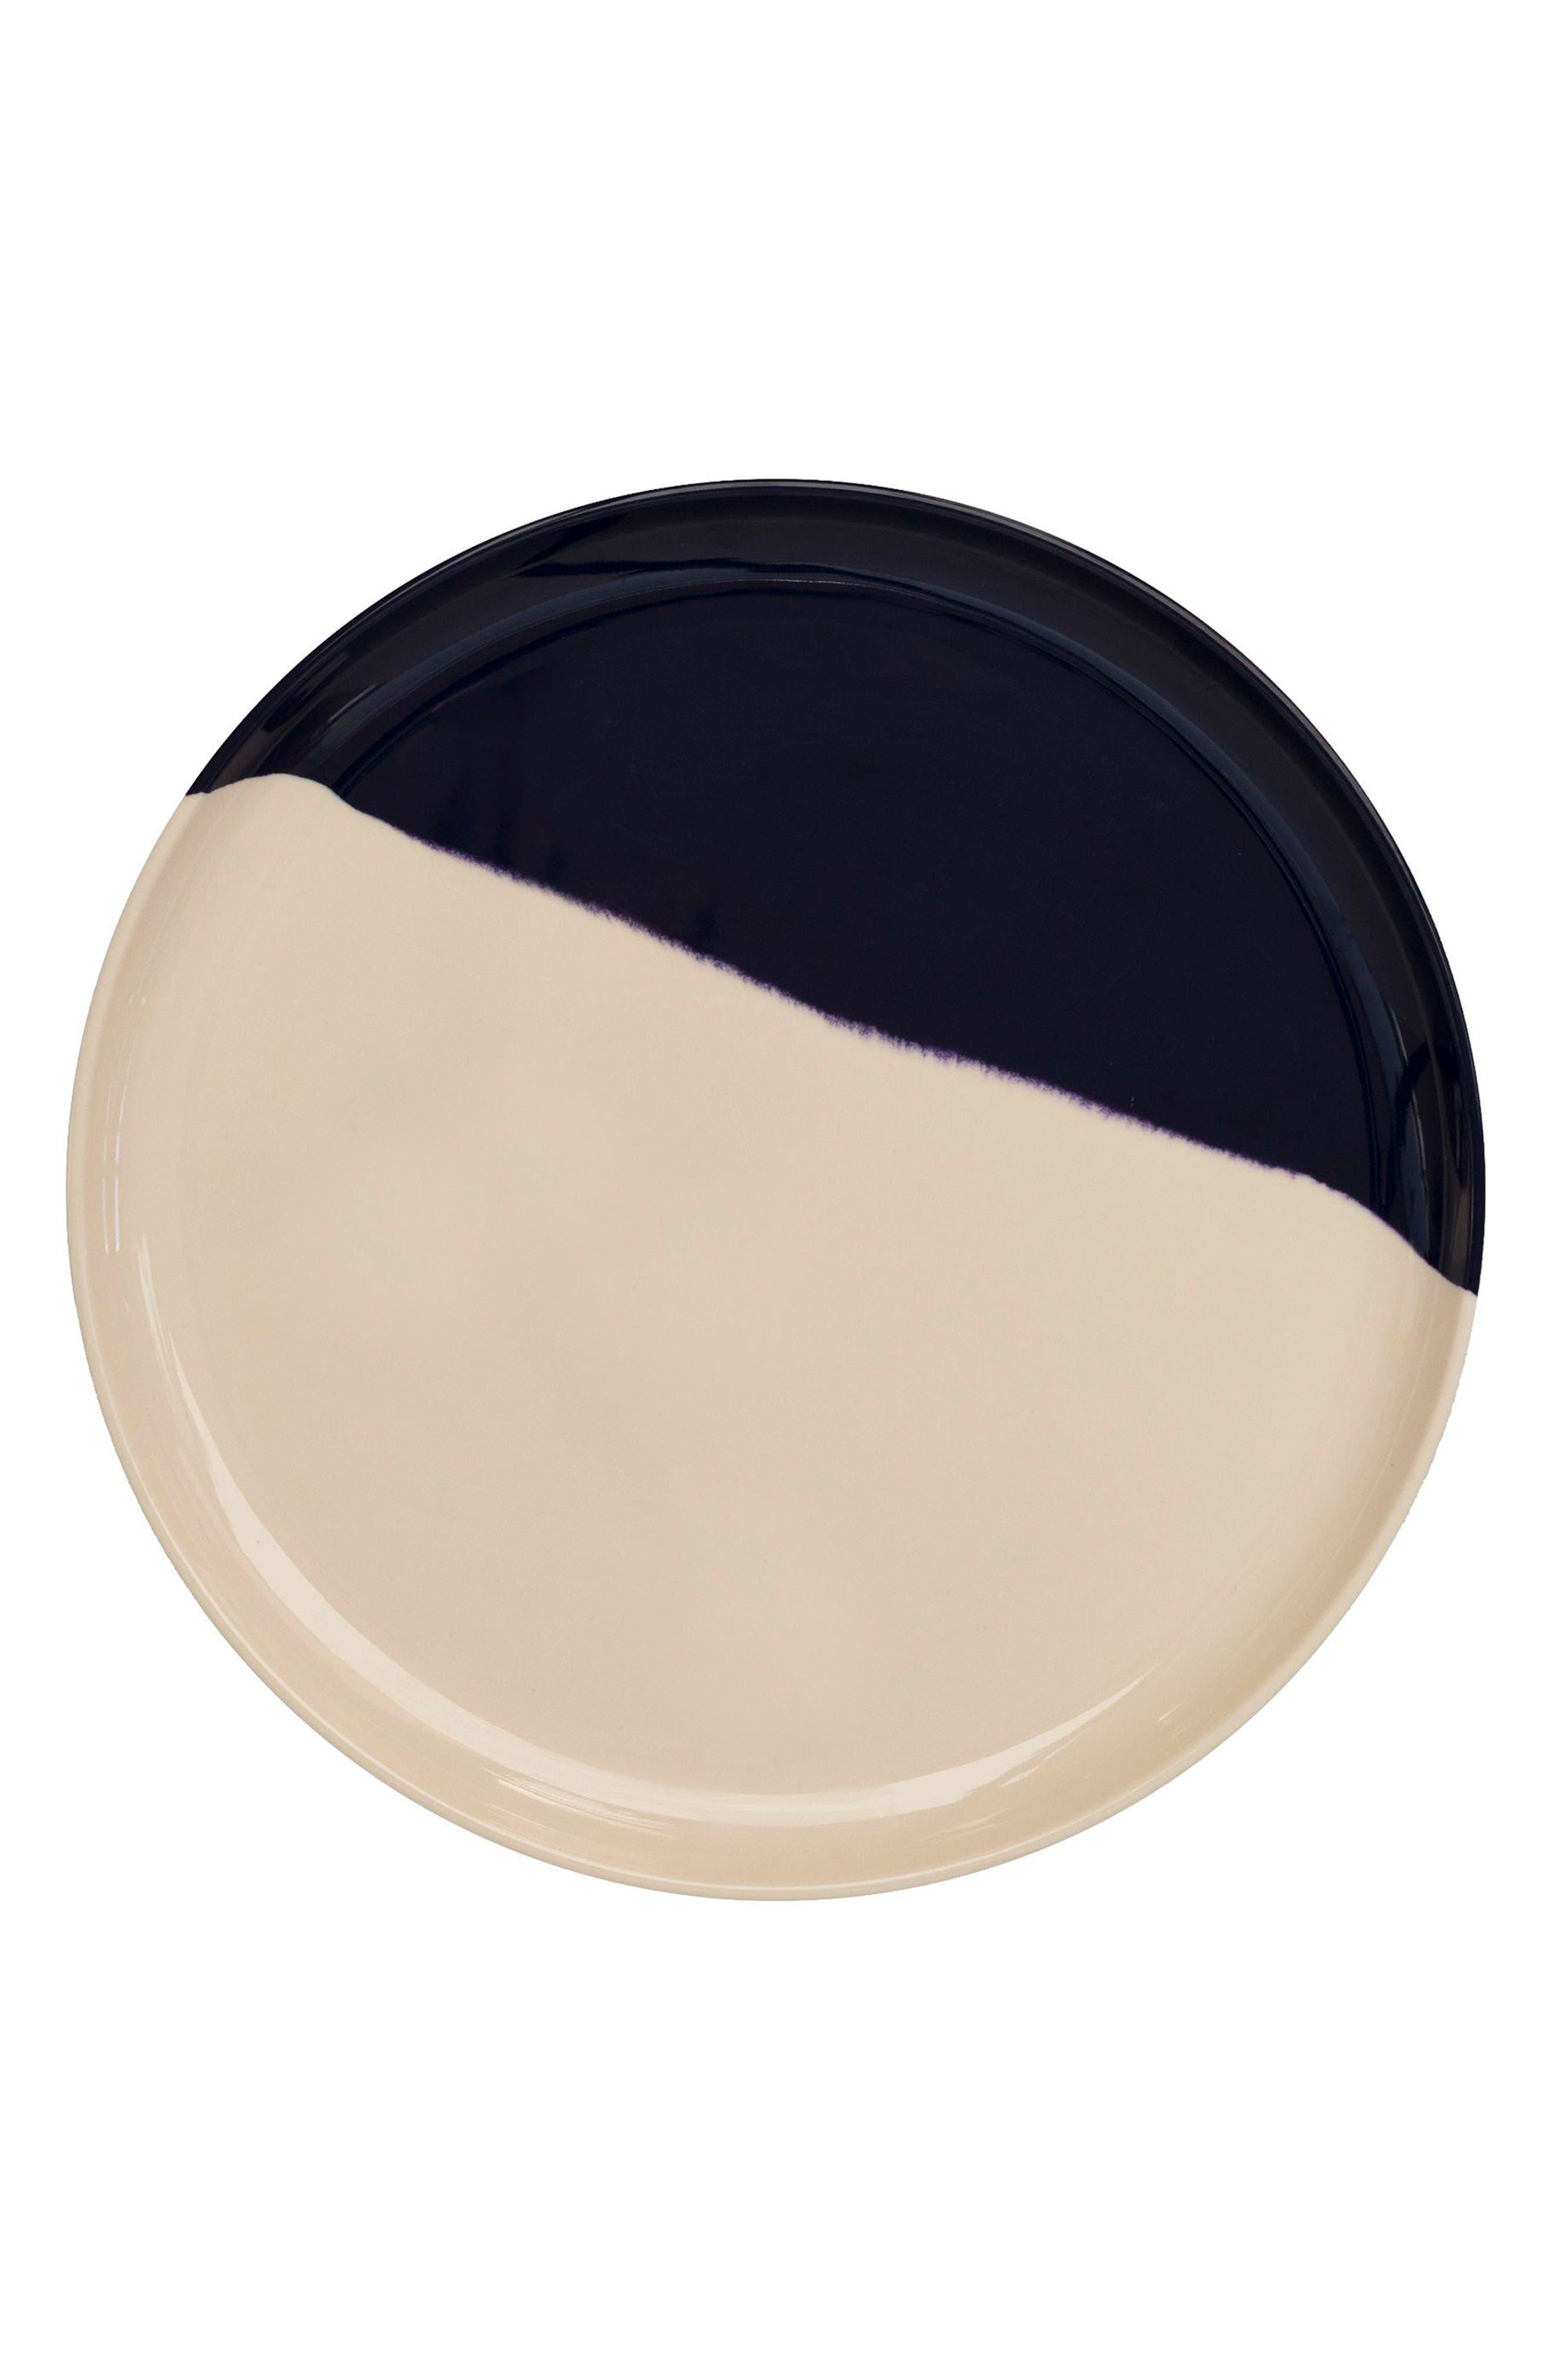 Set of 4 Melamine Side Plates,                             Main thumbnail 1, color,                             IVORY / BLUE